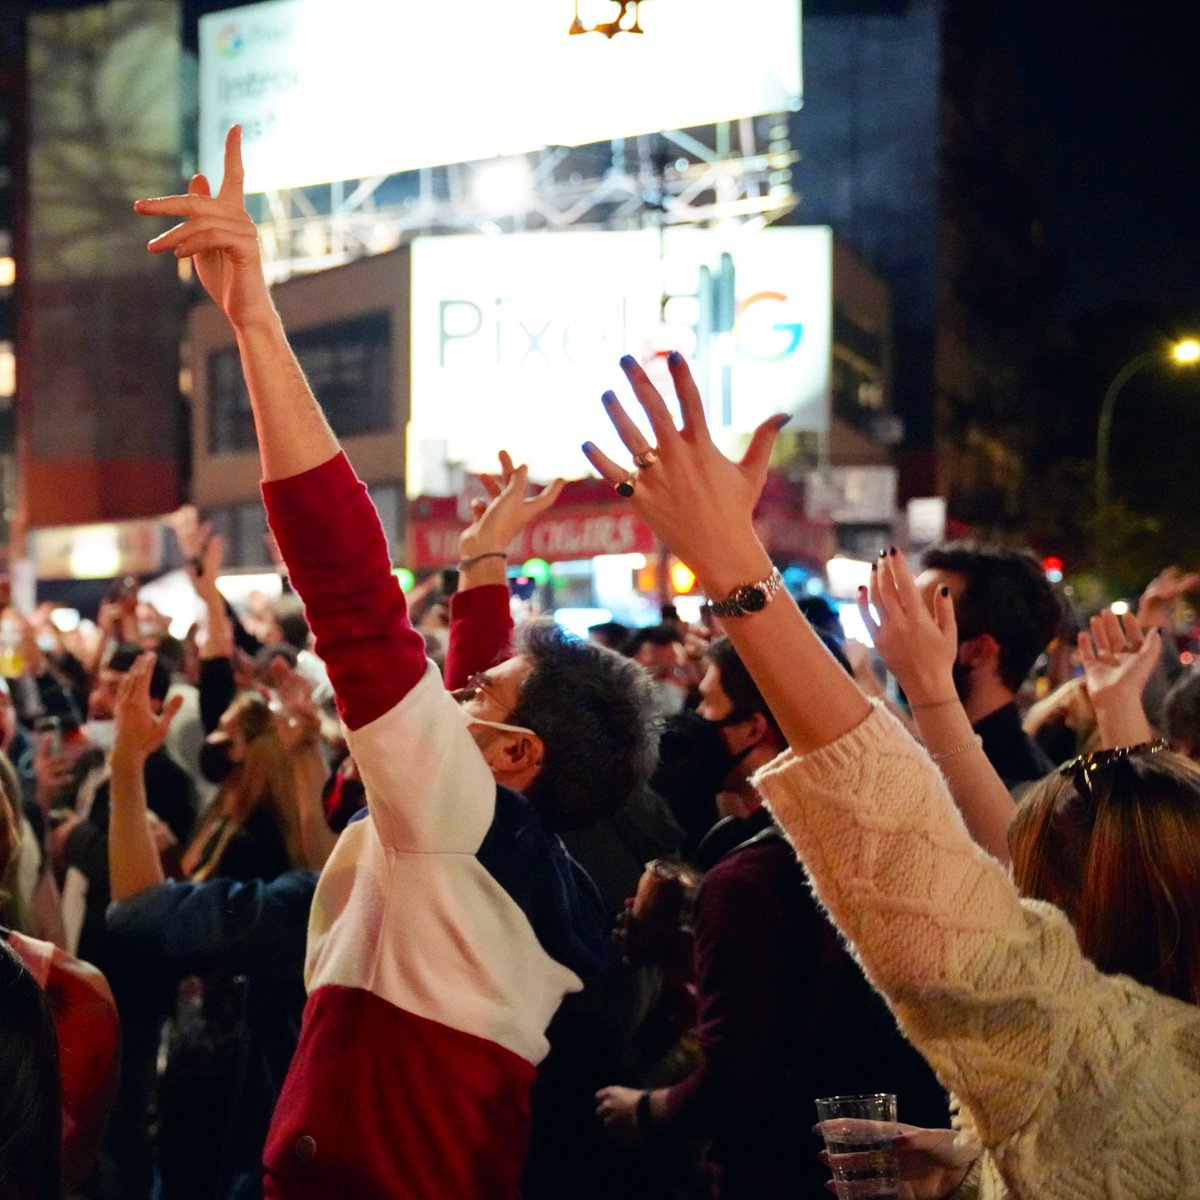 The West Village tonight: